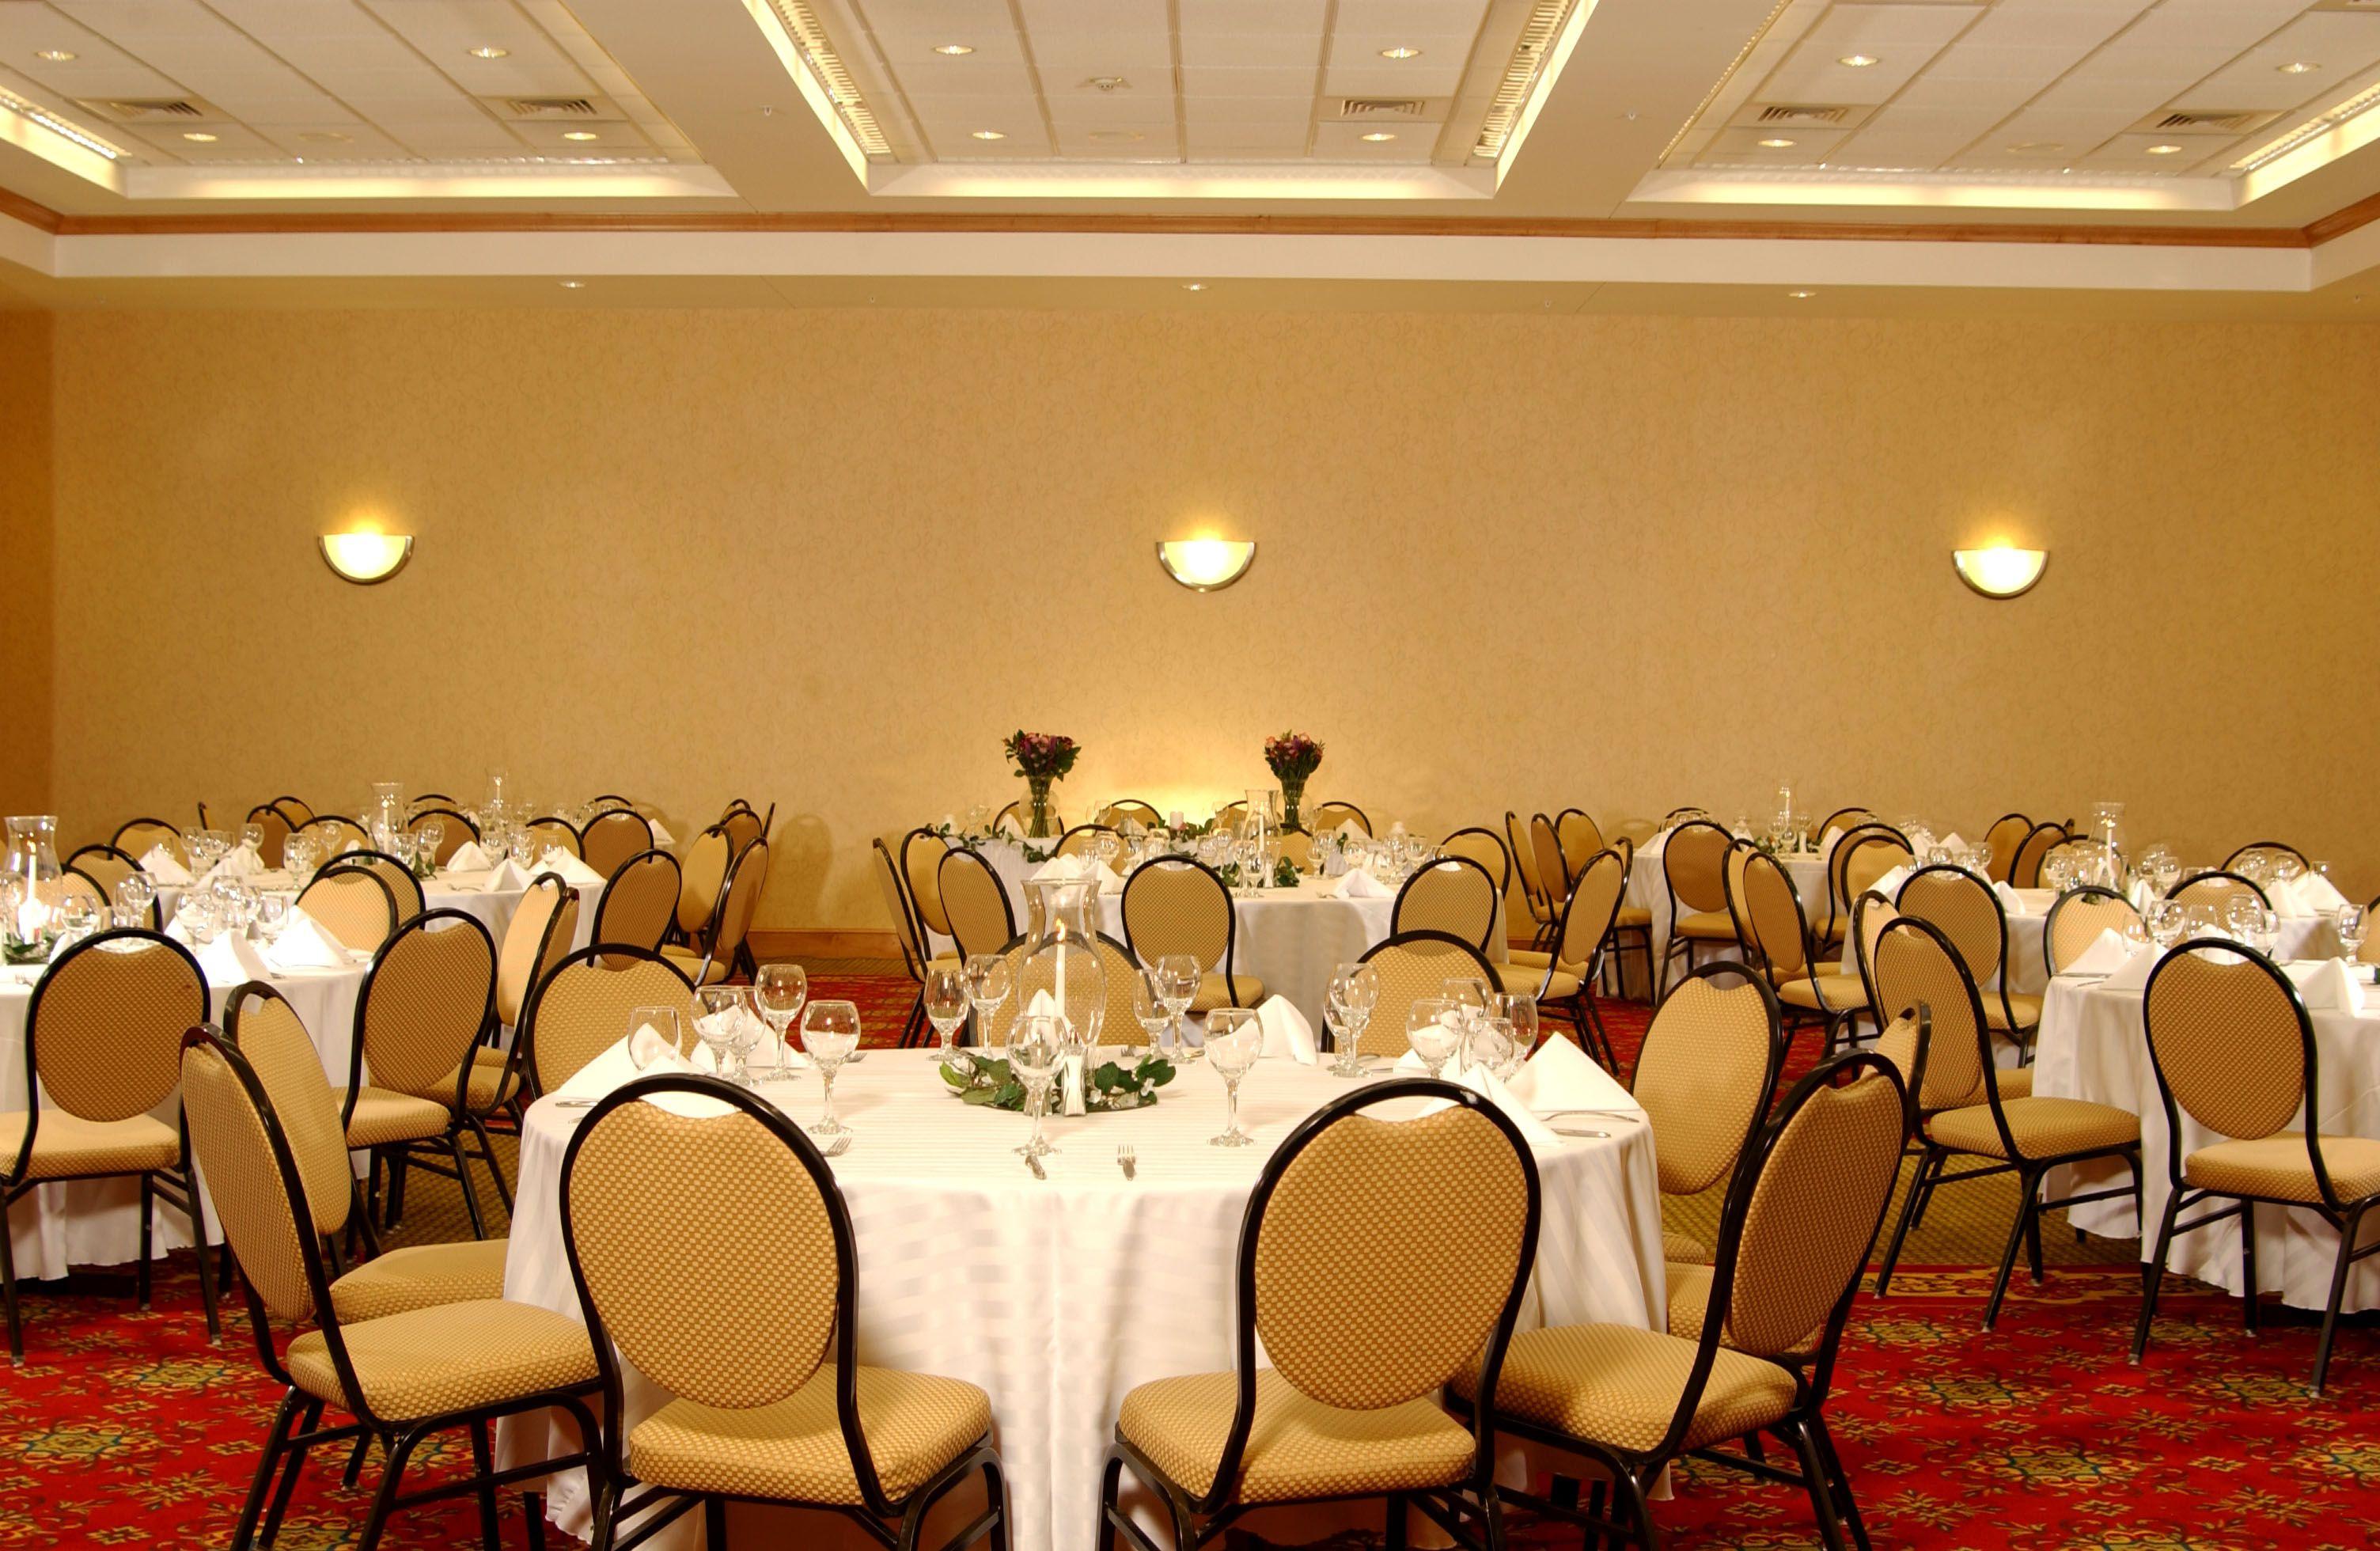 Wedding Ballroom http://hiltongardeninn3.hilton.com/en/hotels ...